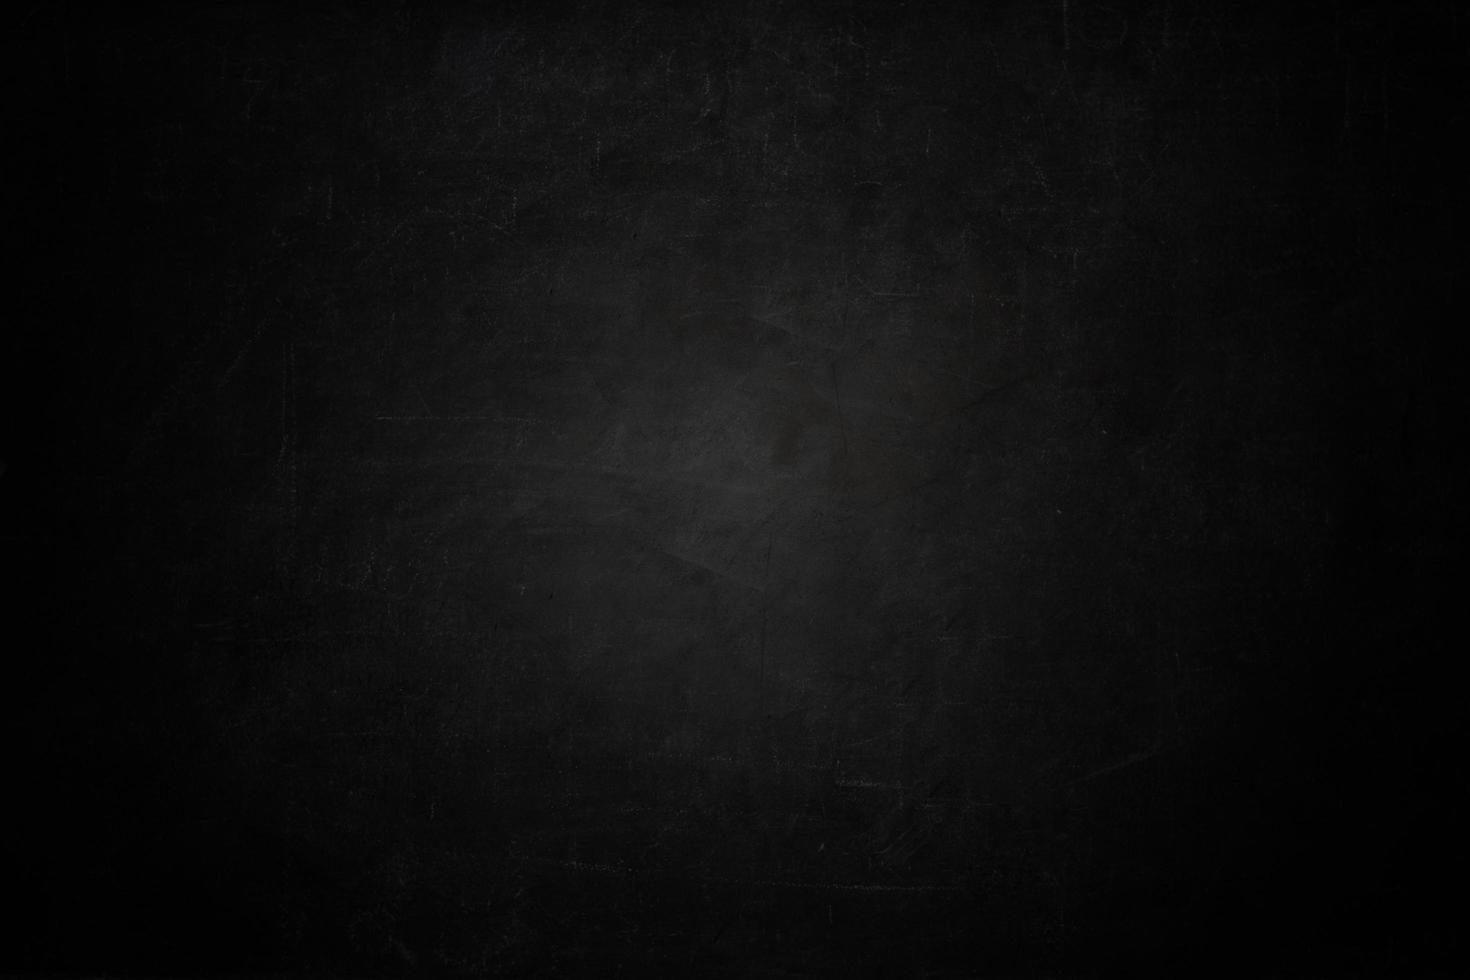 mörk svarta tavlan yta foto